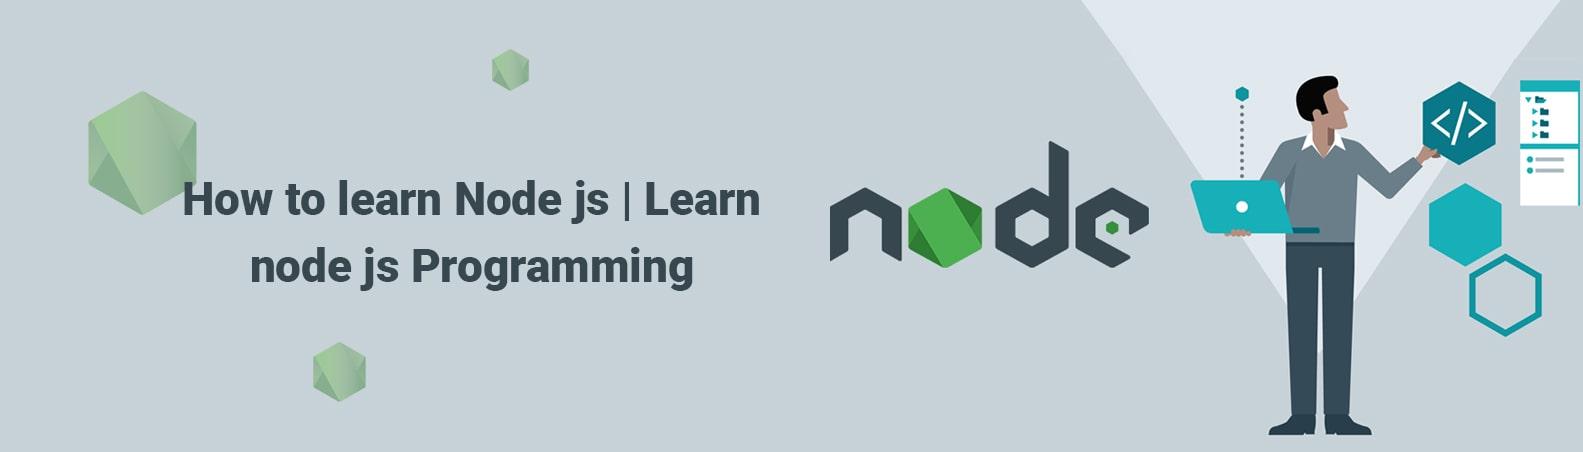 How to learn Node js   Learn node js Programming